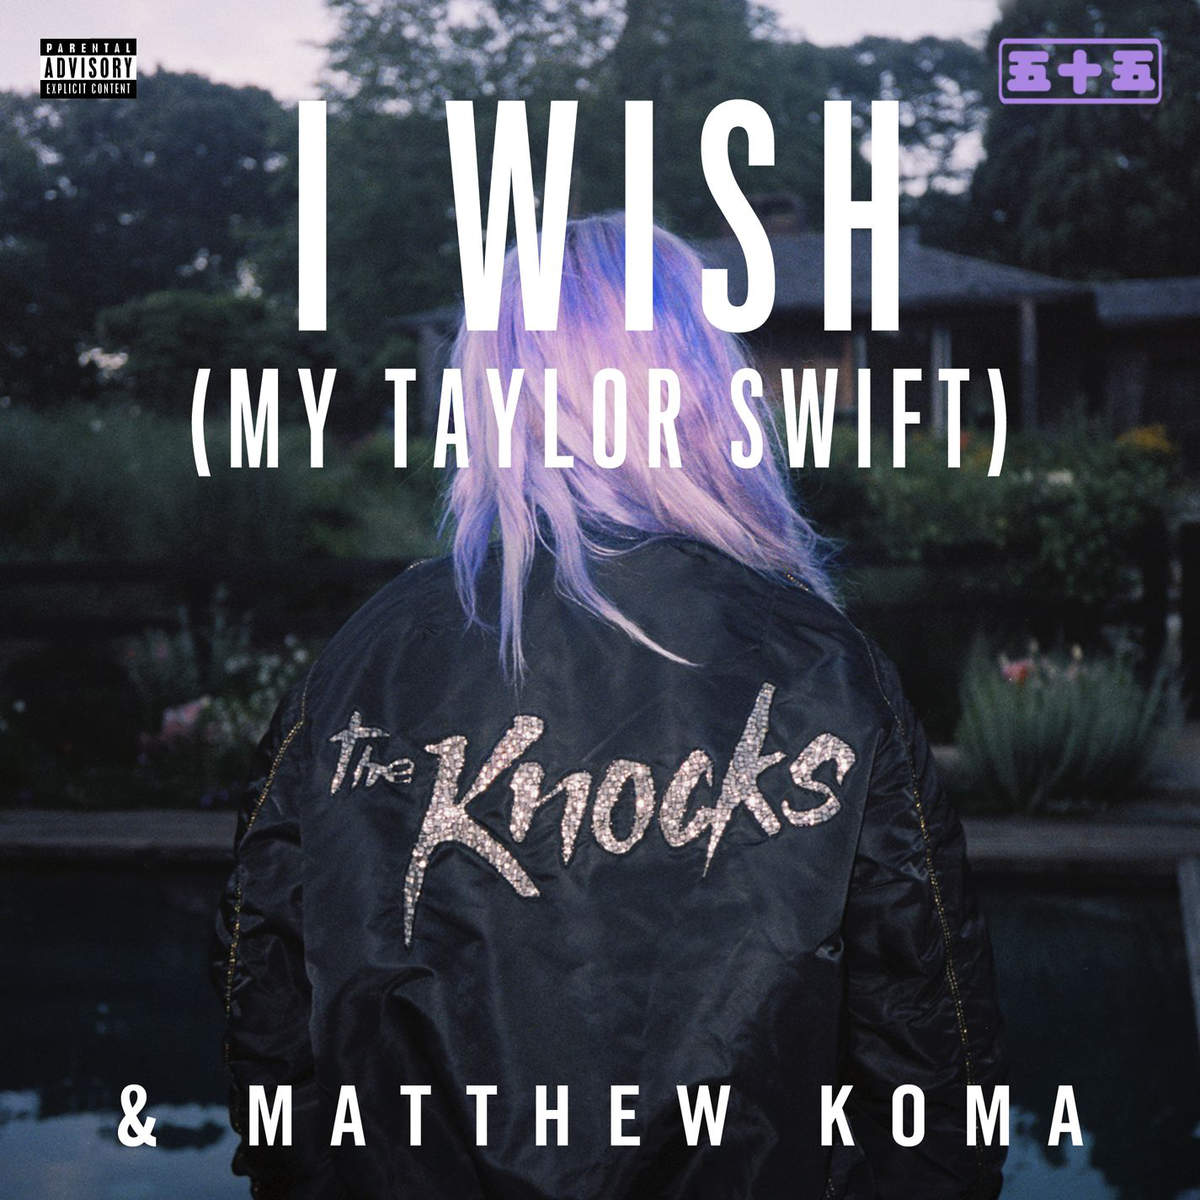 the-knocks-i-wish-my-taylor-swift-matthew-koma